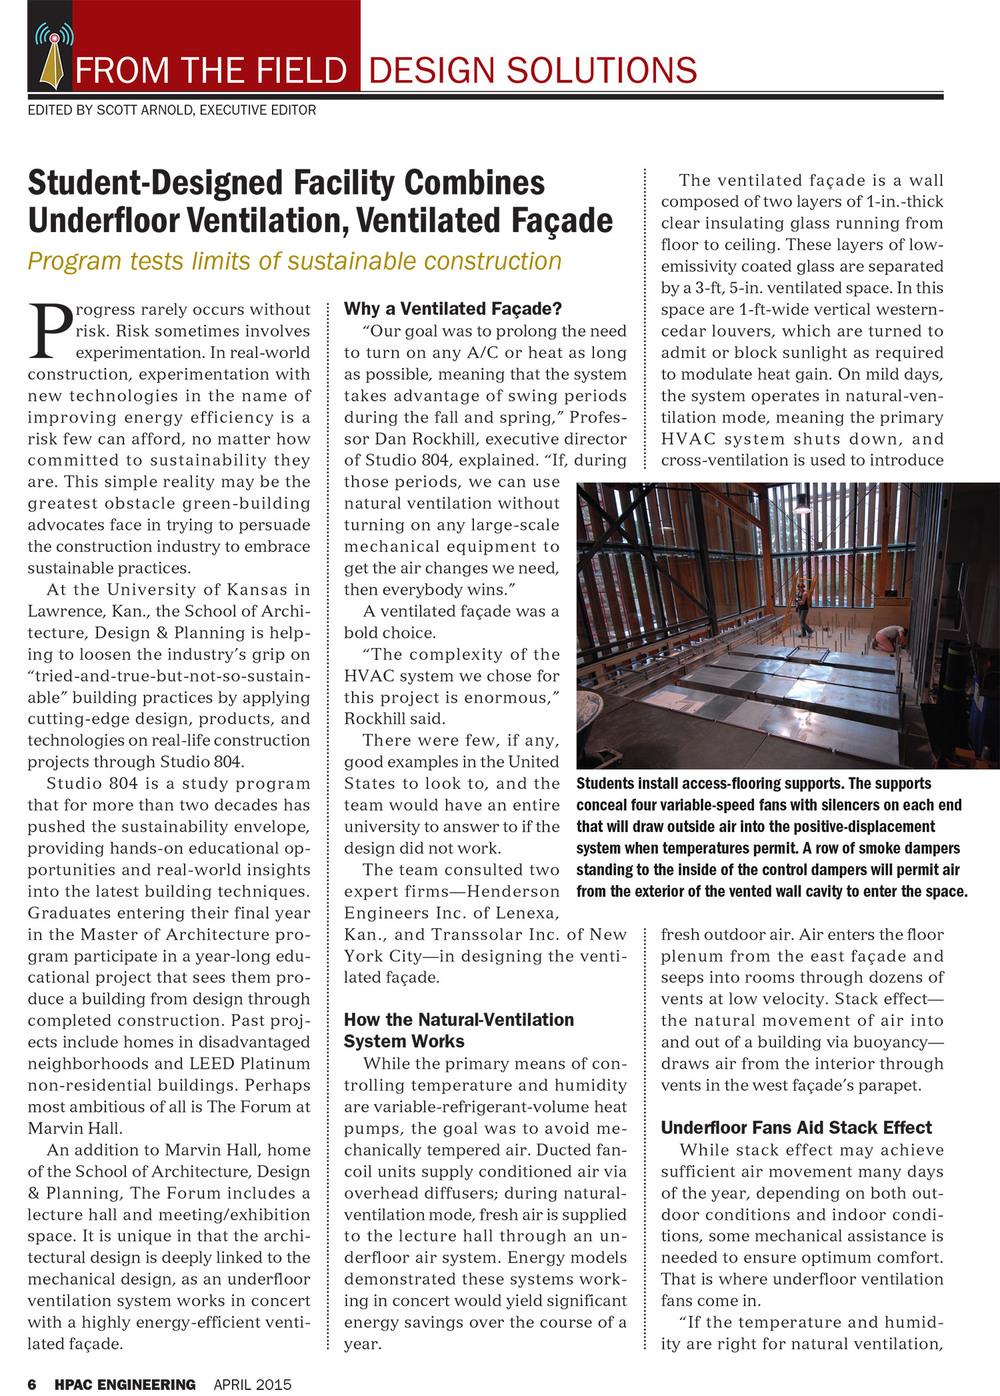 trish-holder-feature-article-hvac-marketing-communications-portfolio-6-page-1.jpg